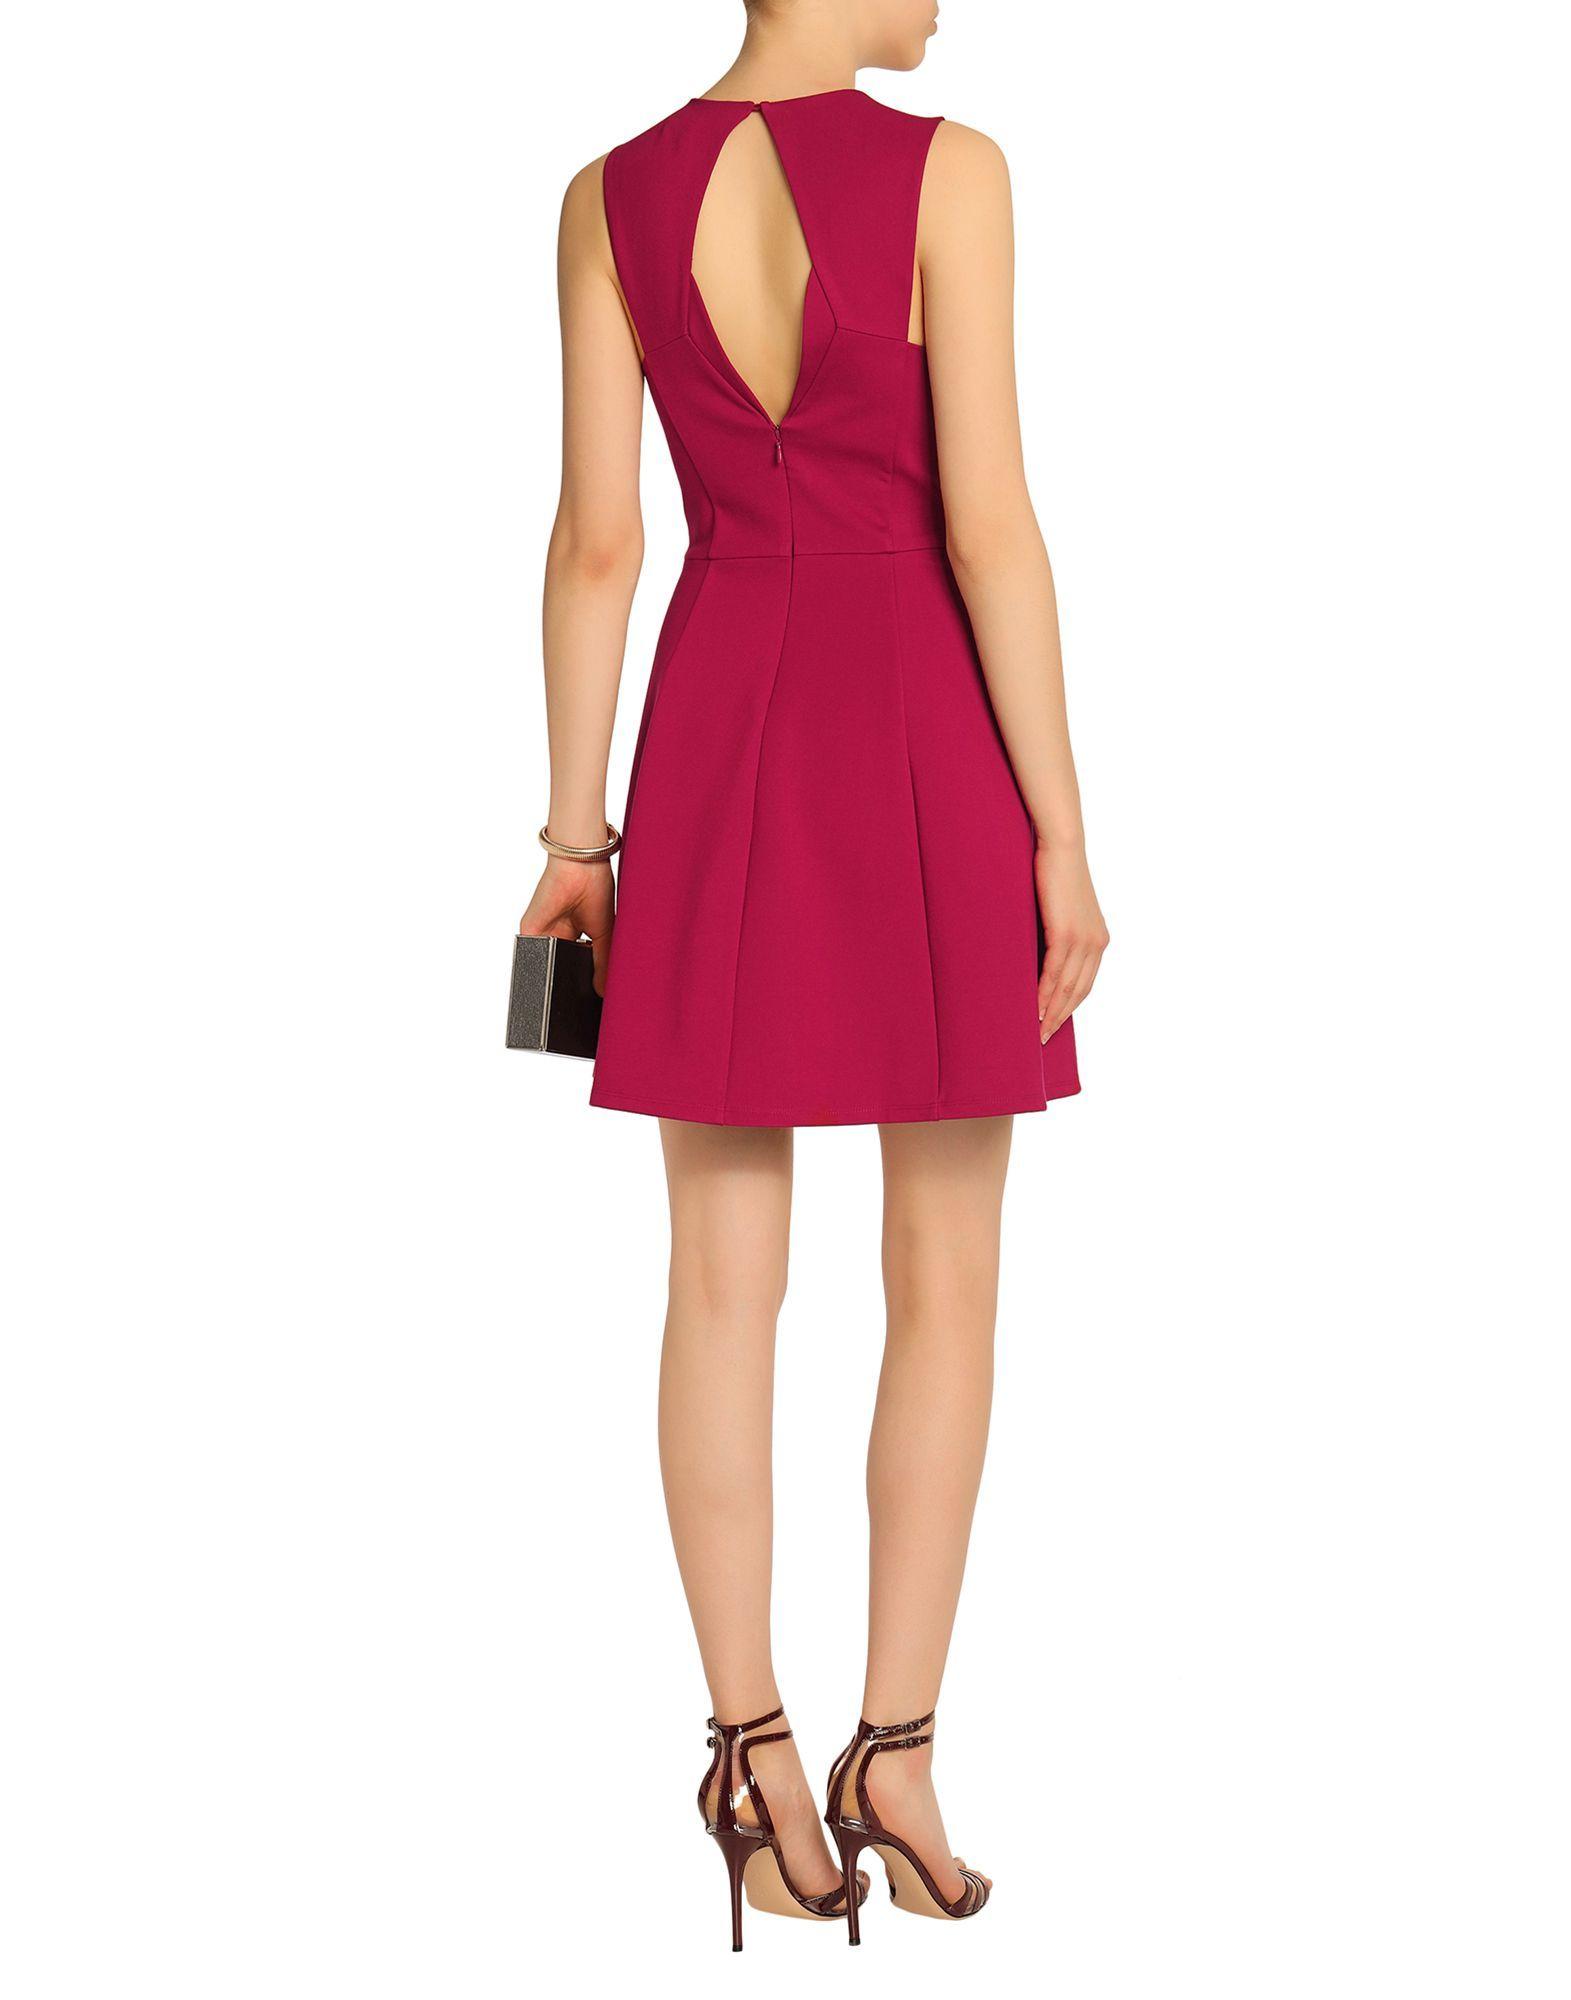 Halston Garnet Short Dress